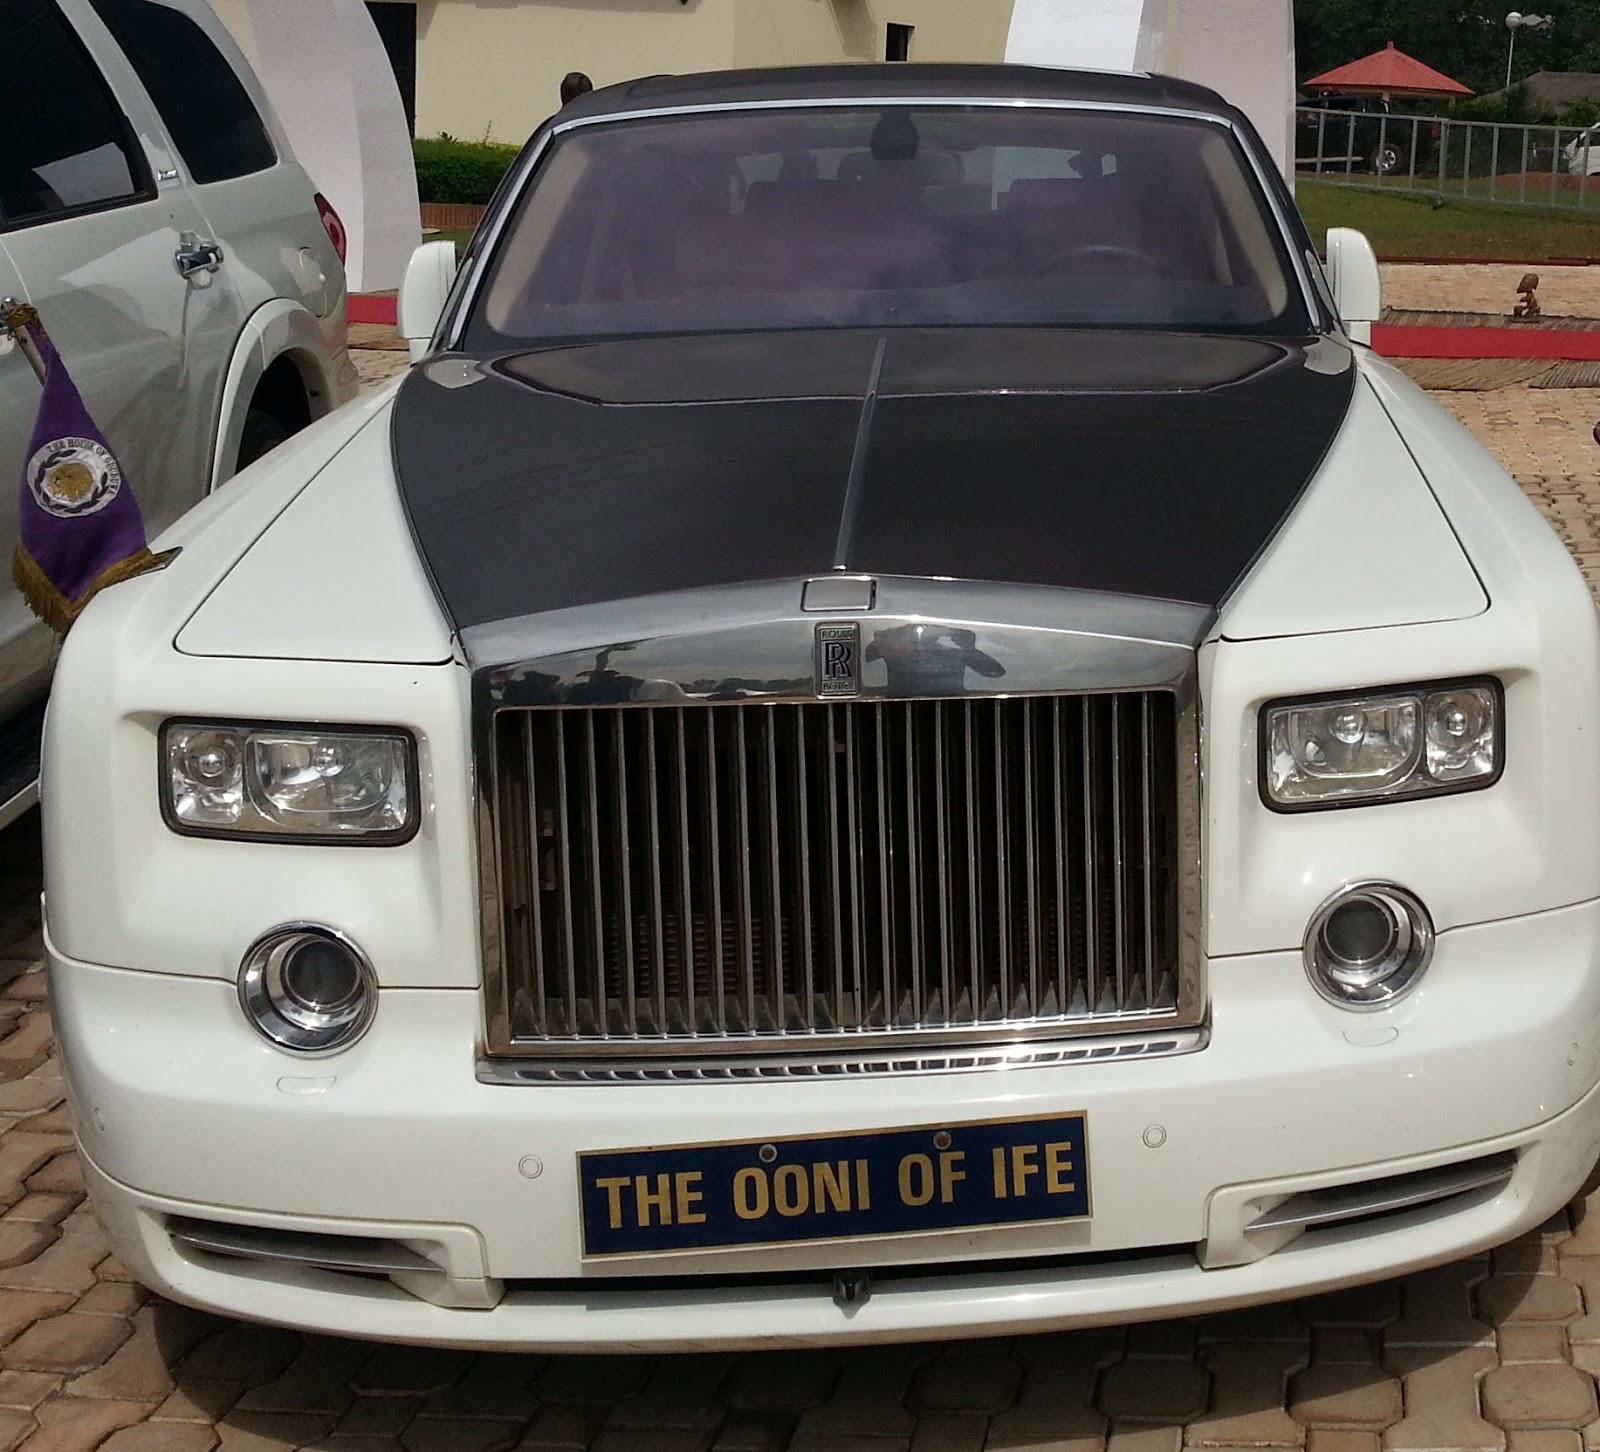 ooni ife rolls royce car